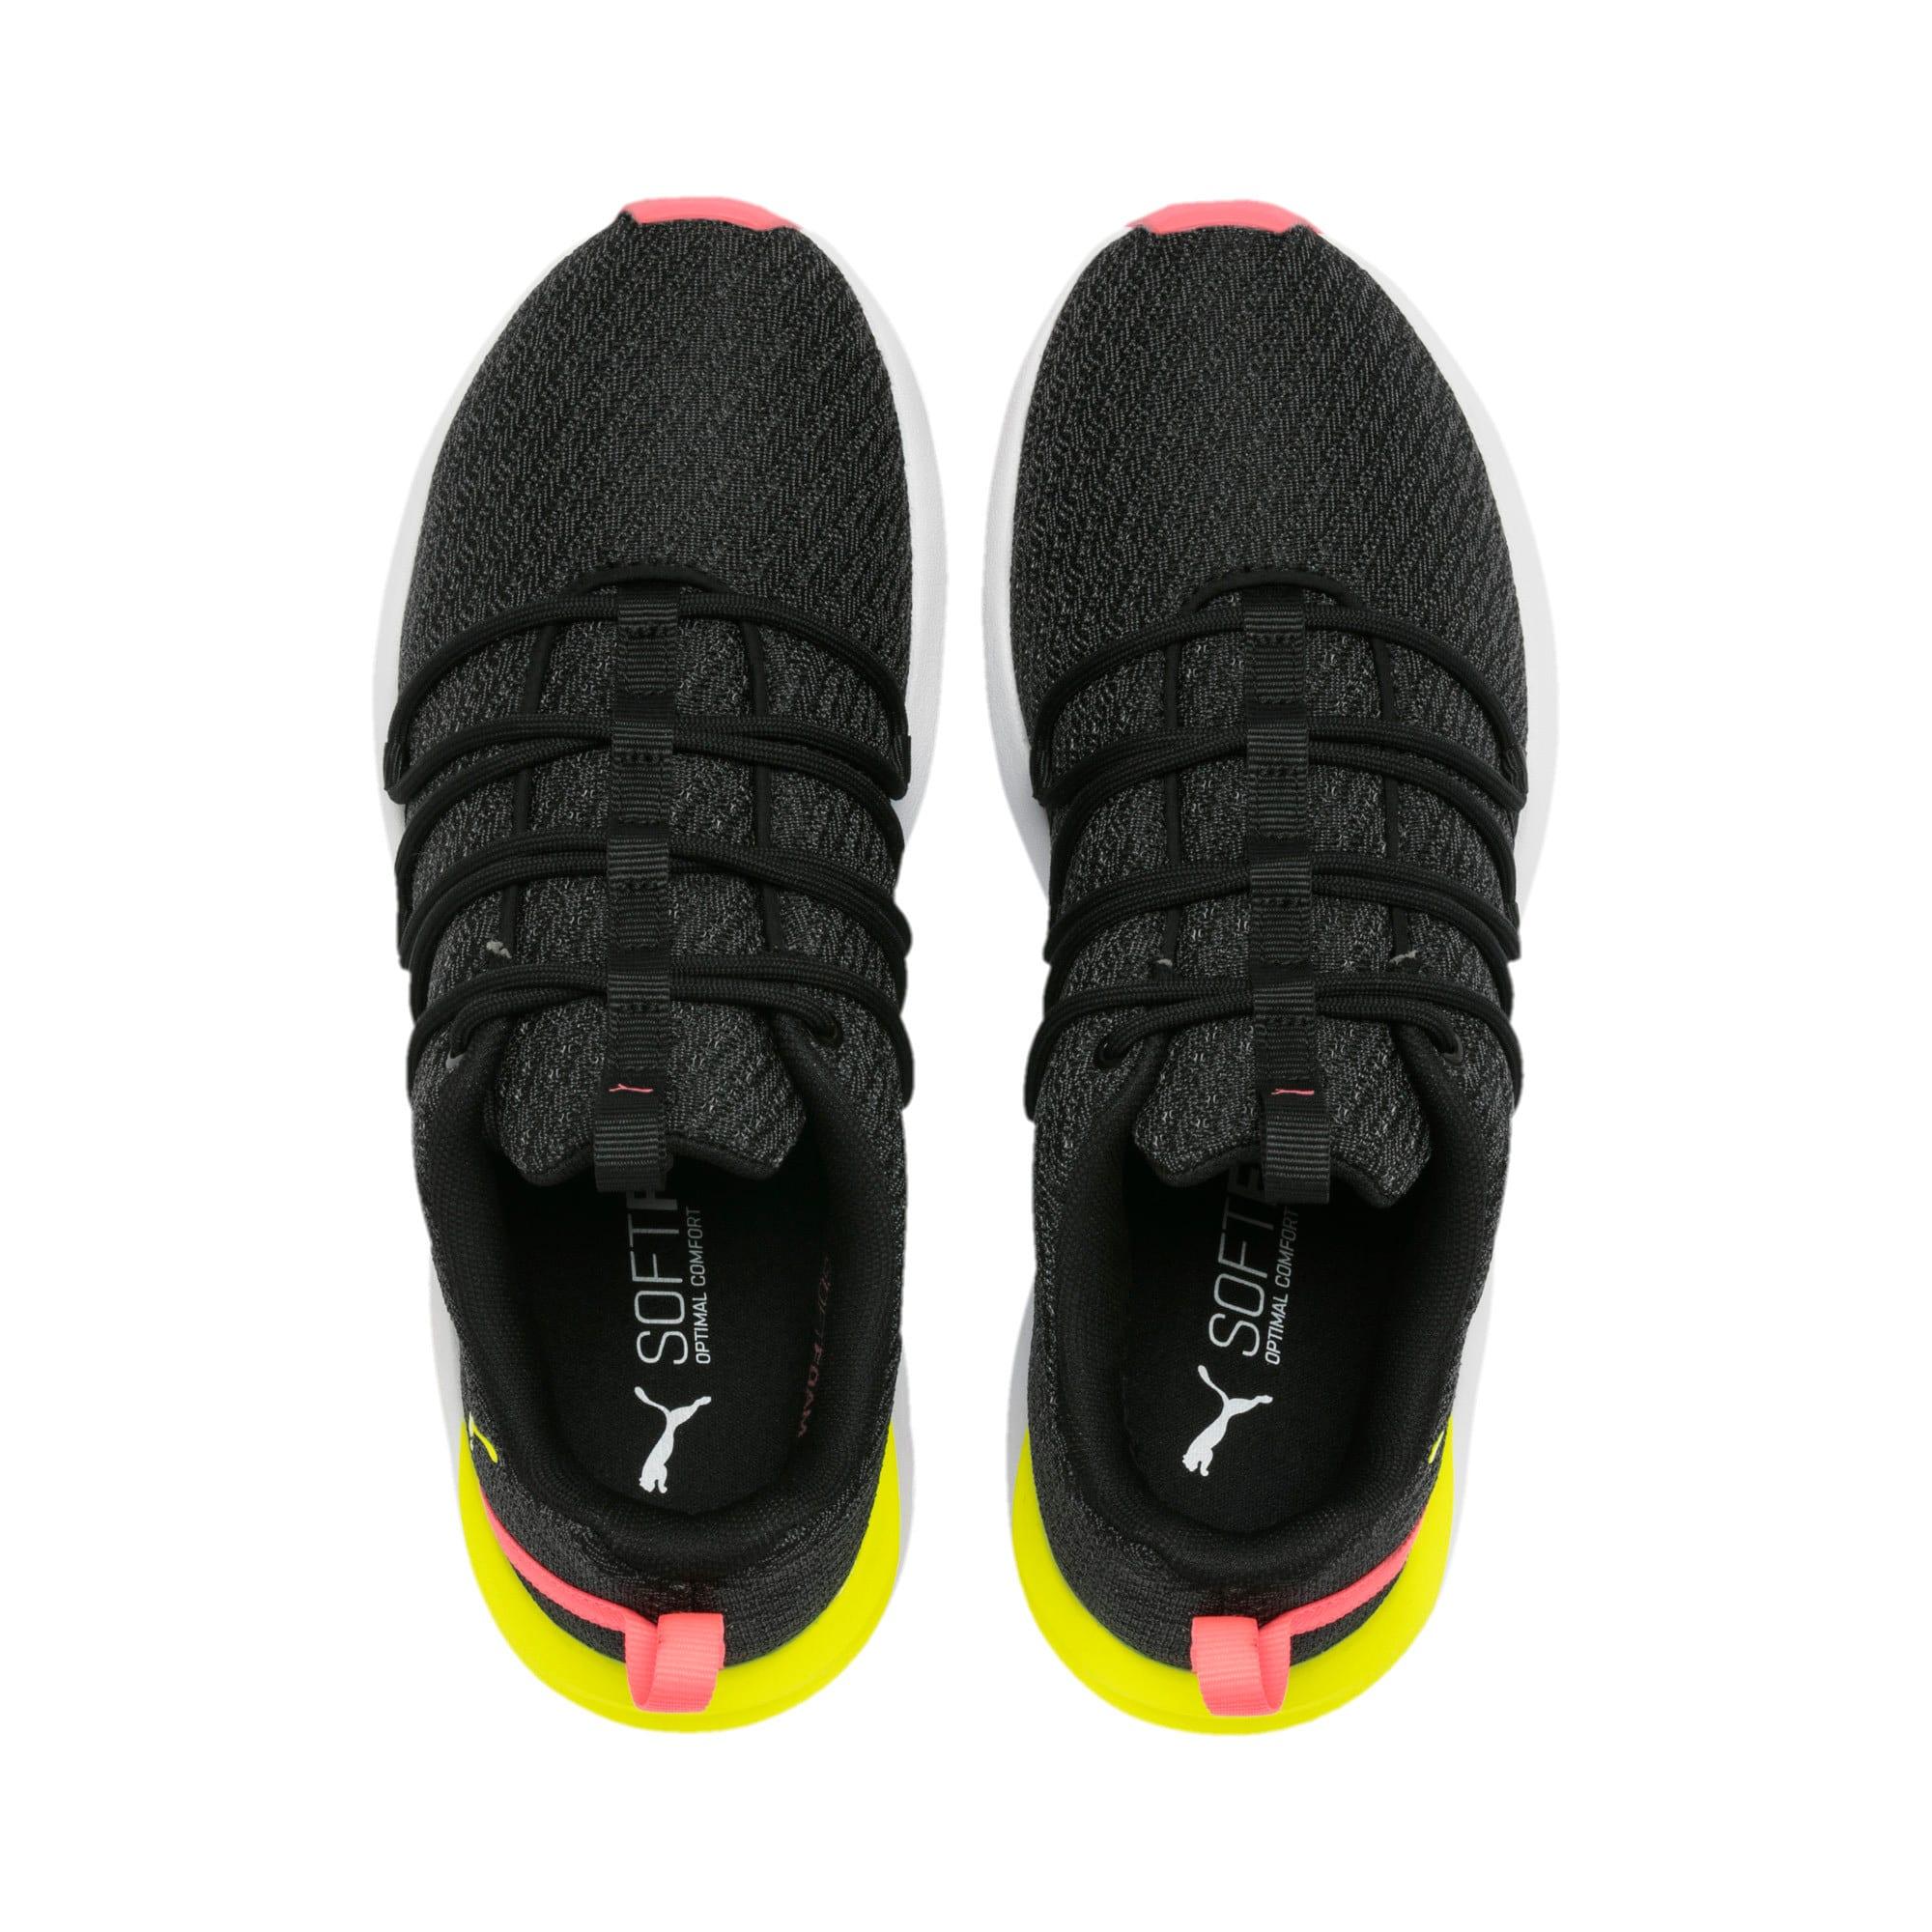 Thumbnail 7 of Prowl Alt Neon Women's Training Shoes, Puma Black-Yellow Alert, medium